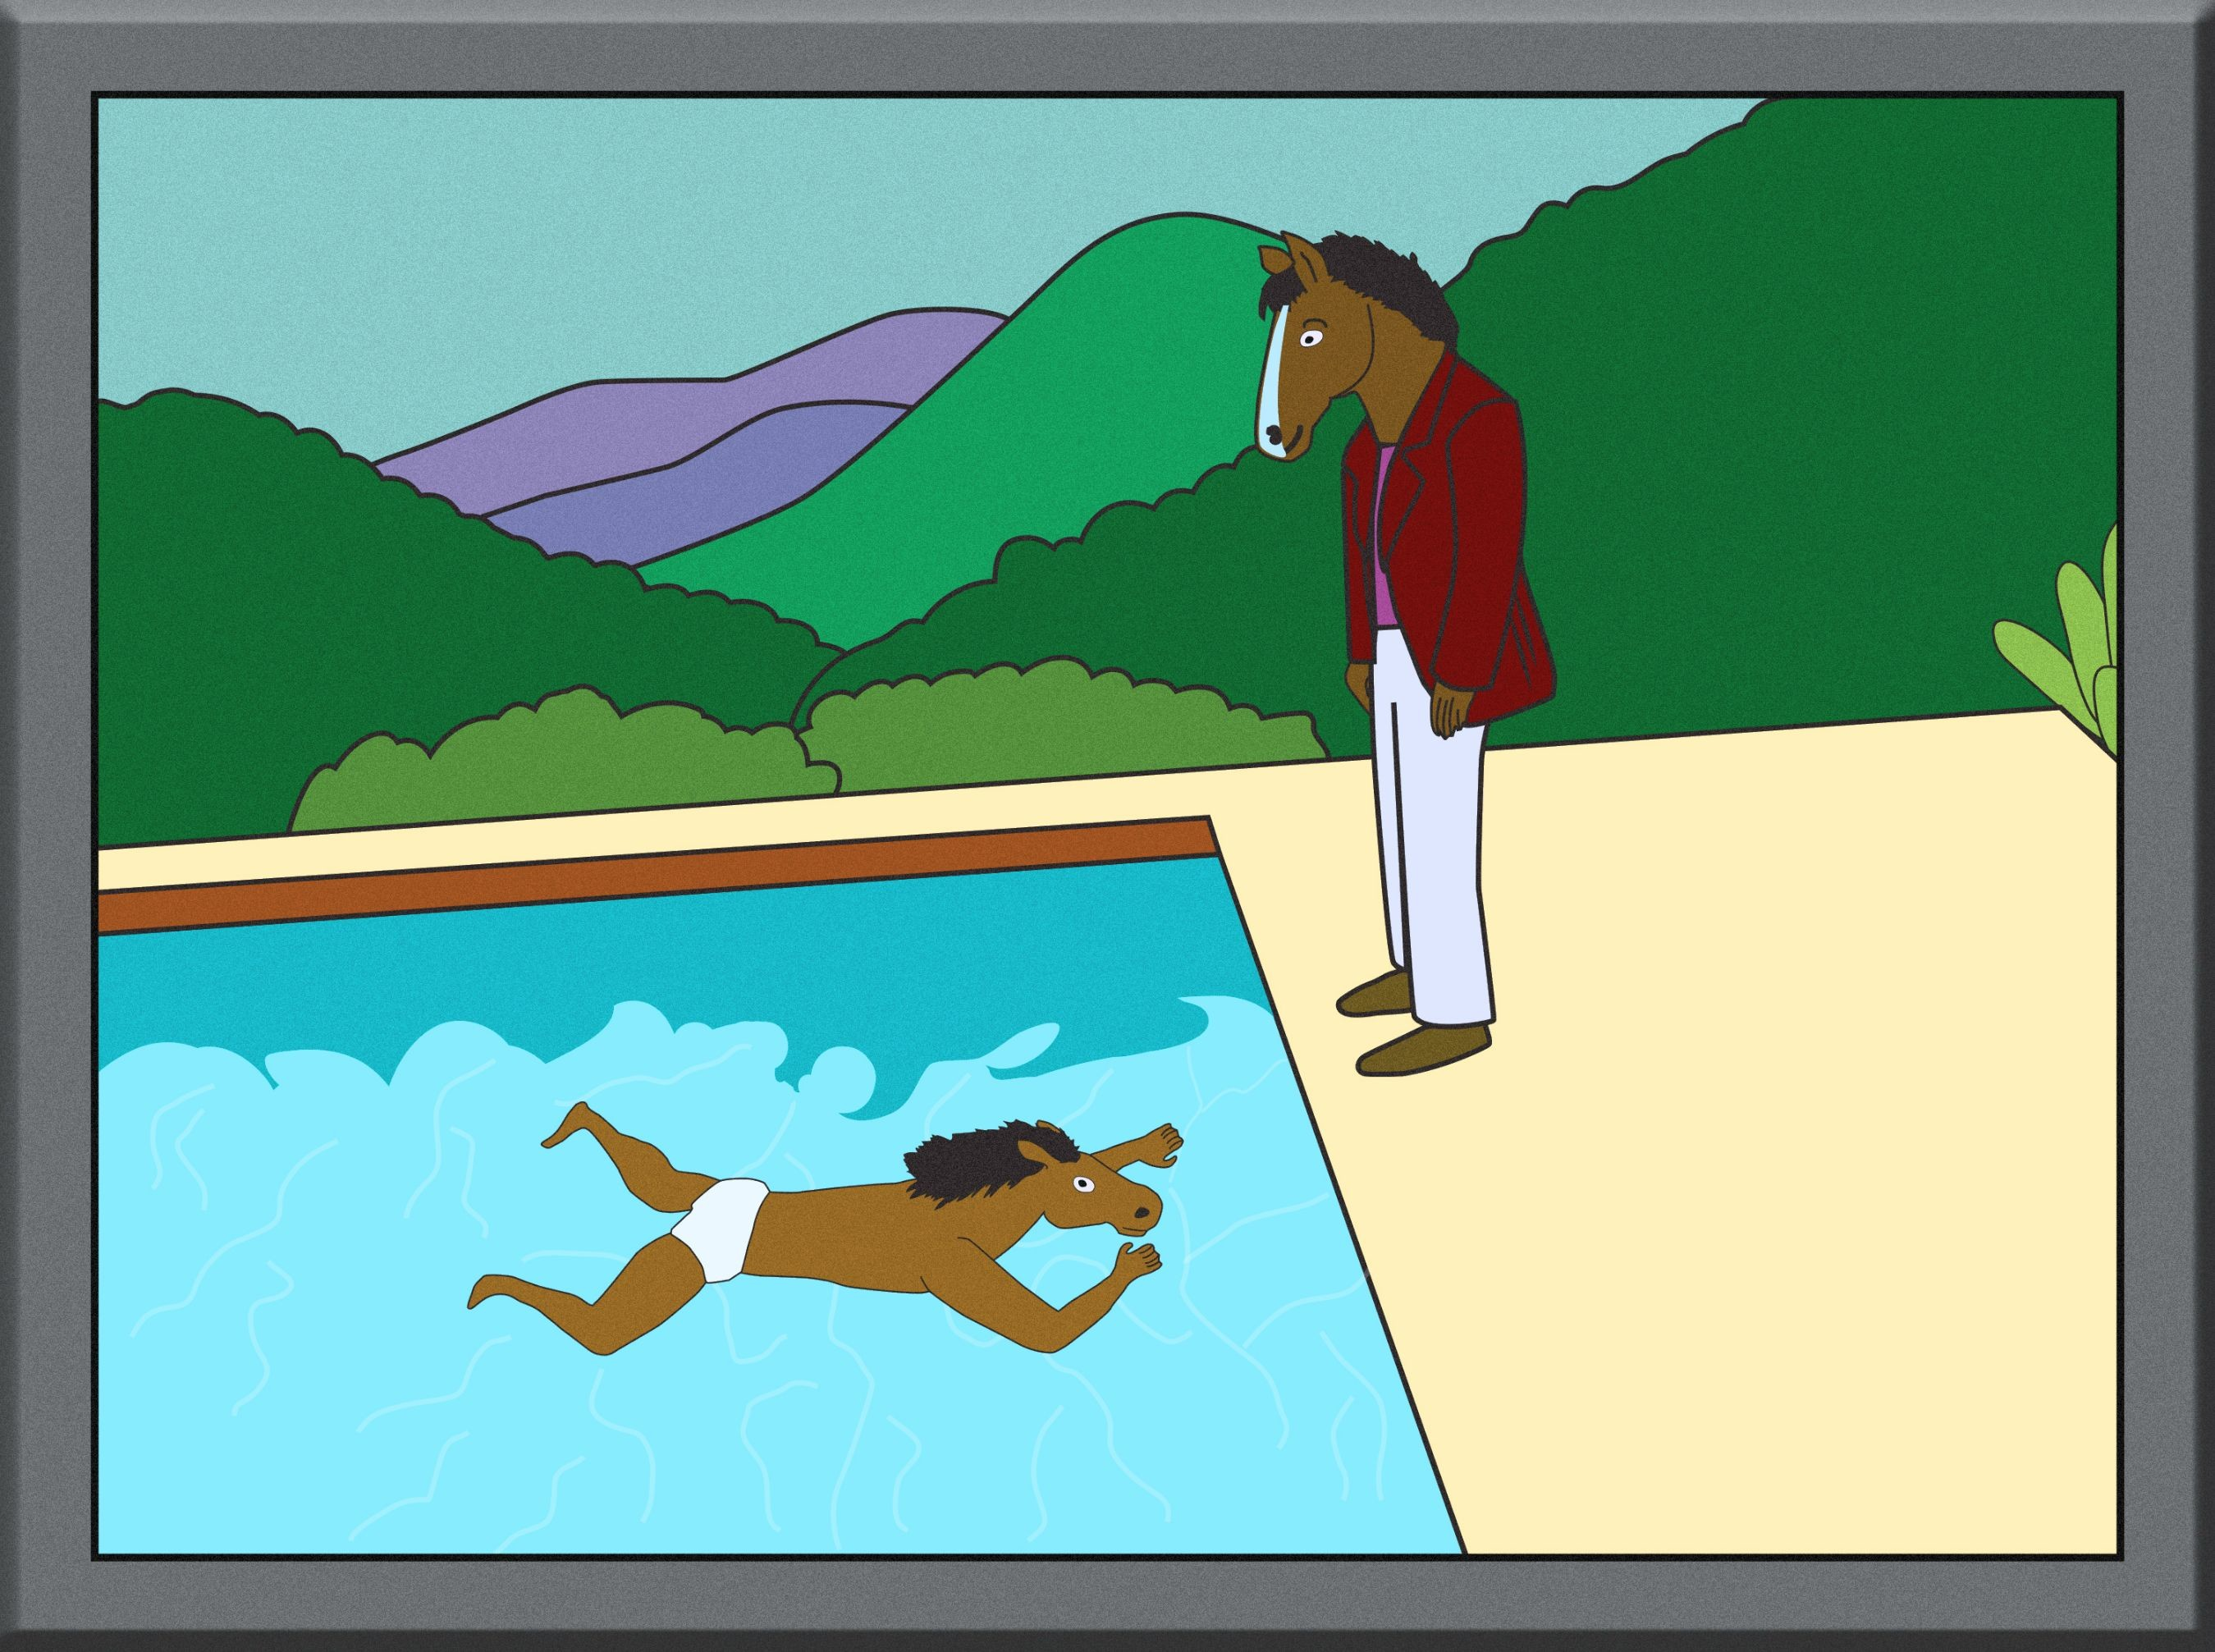 Bojack Horseman Wallpapers (83+ images)